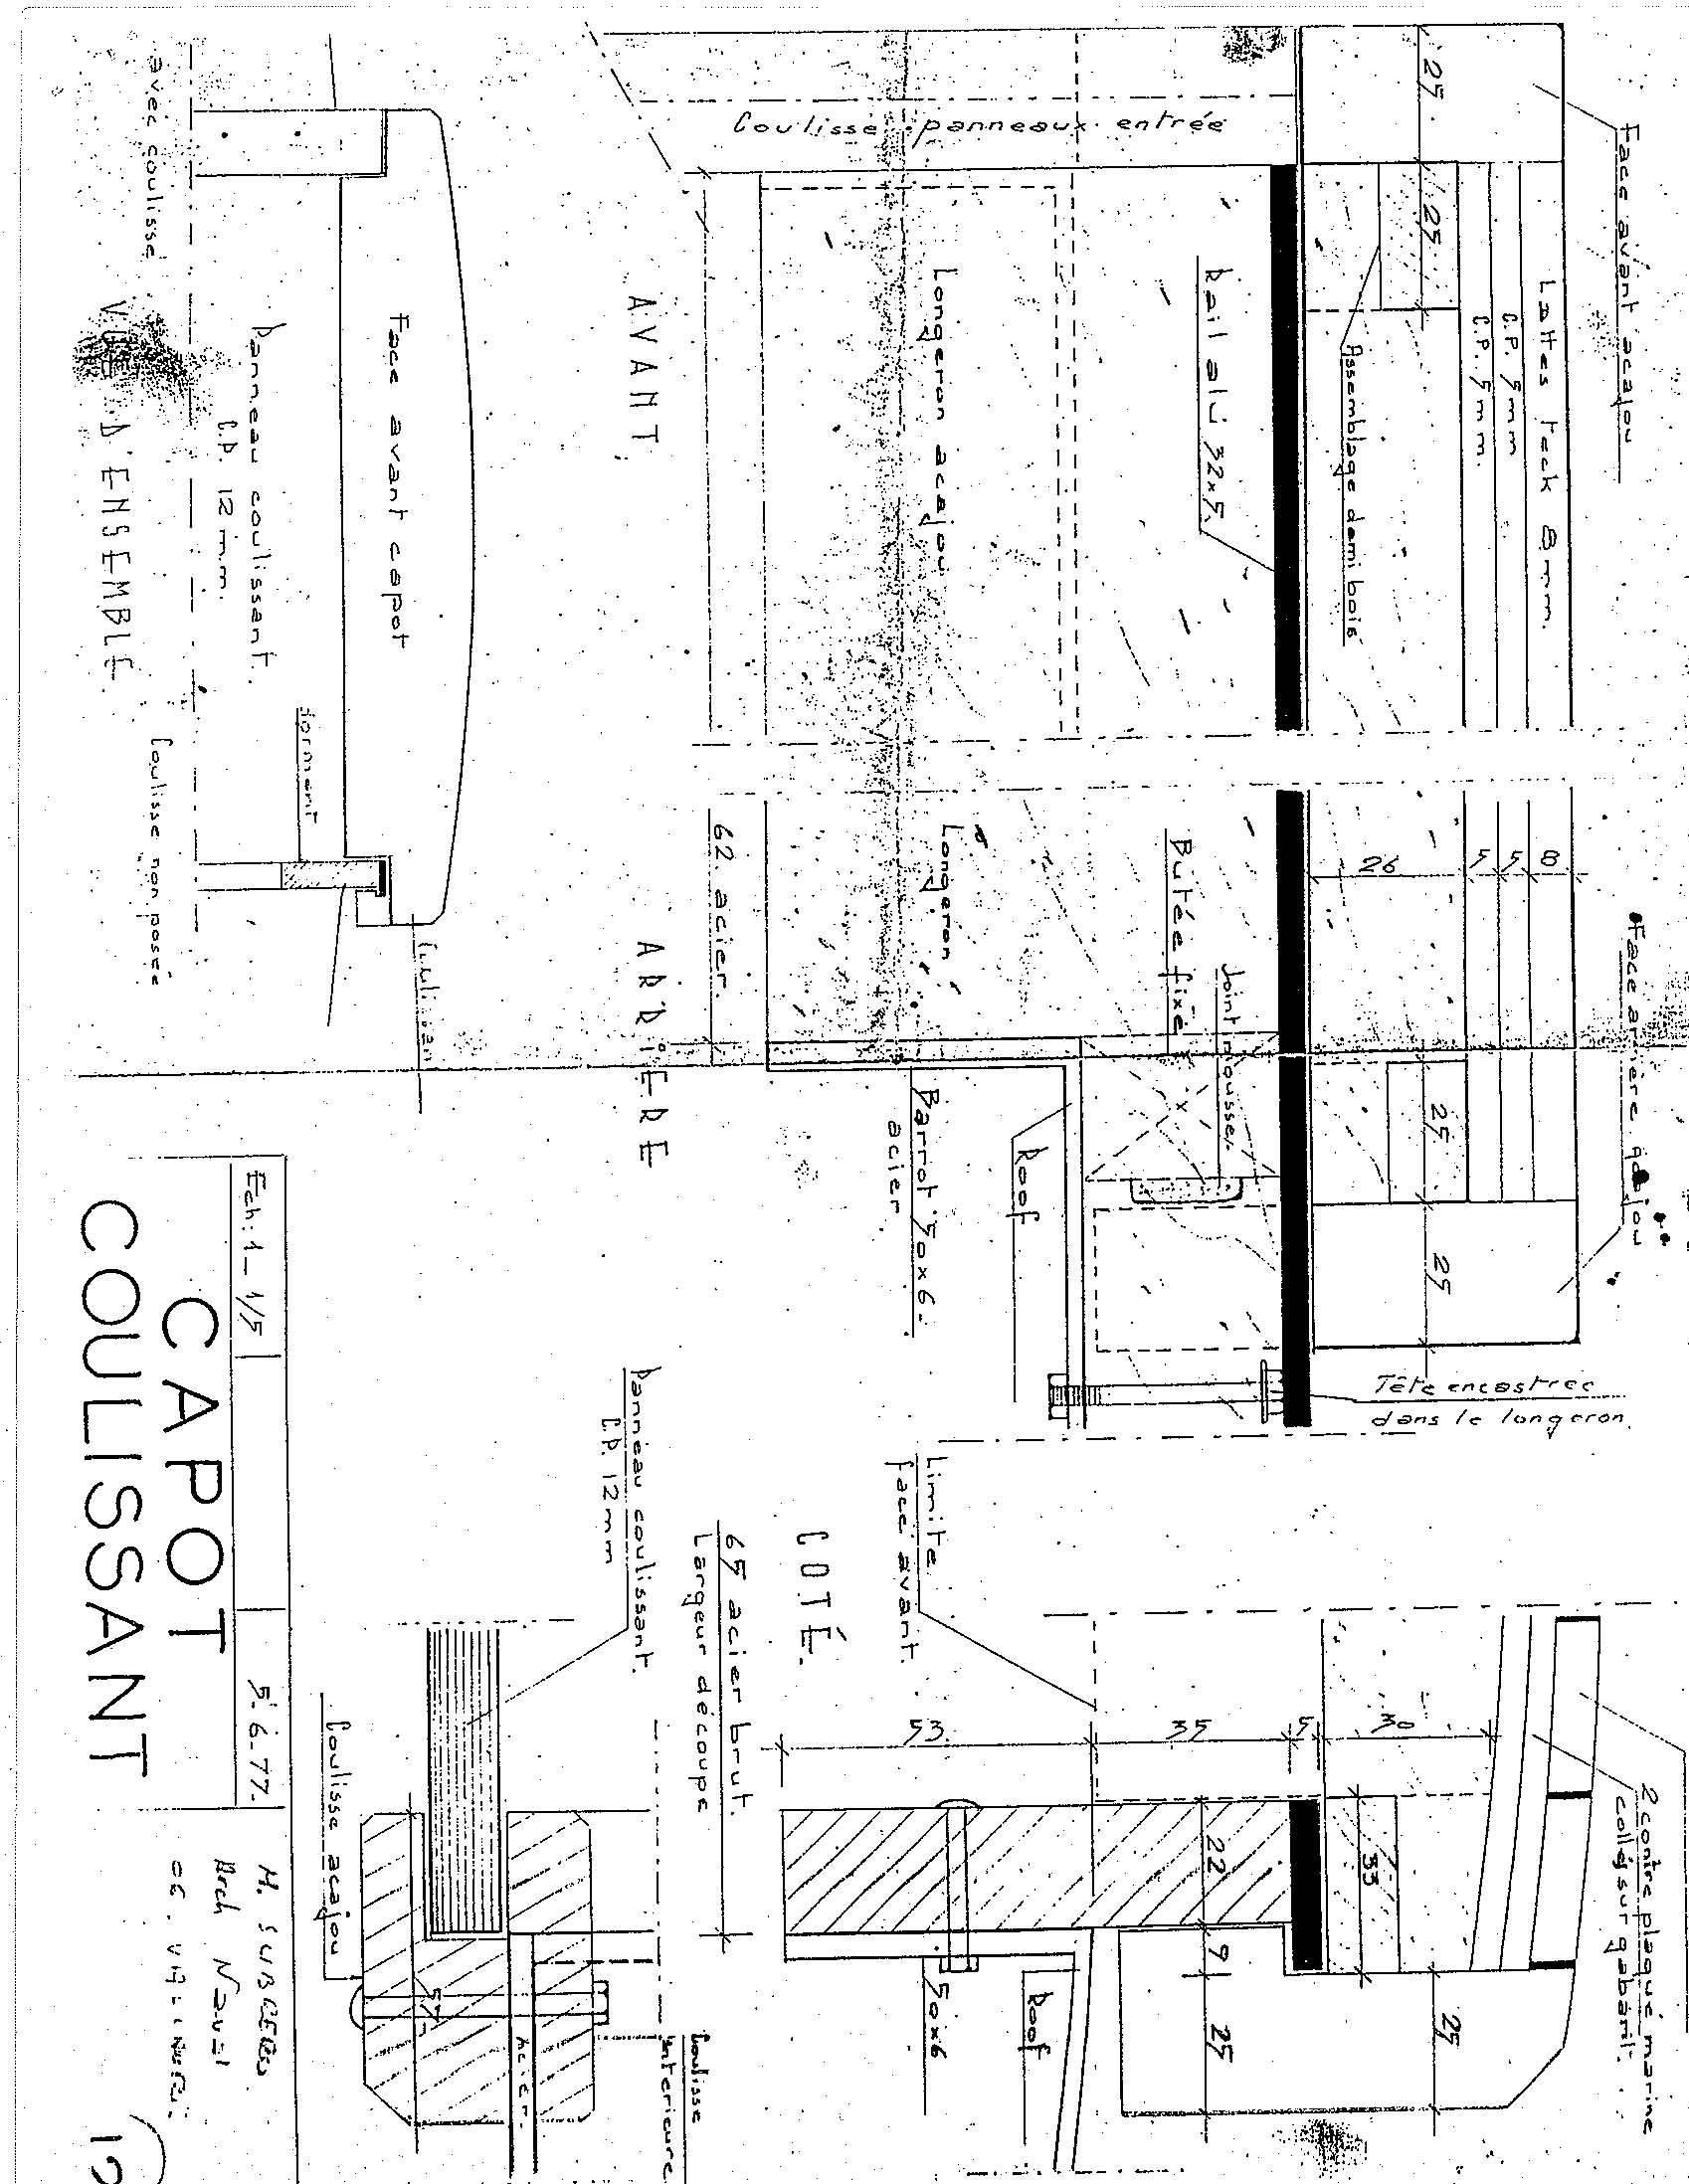 Fantastic Jay Turser Wiring Diagram Auto Electrical Wiring Diagram Wiring Digital Resources Cettecompassionincorg